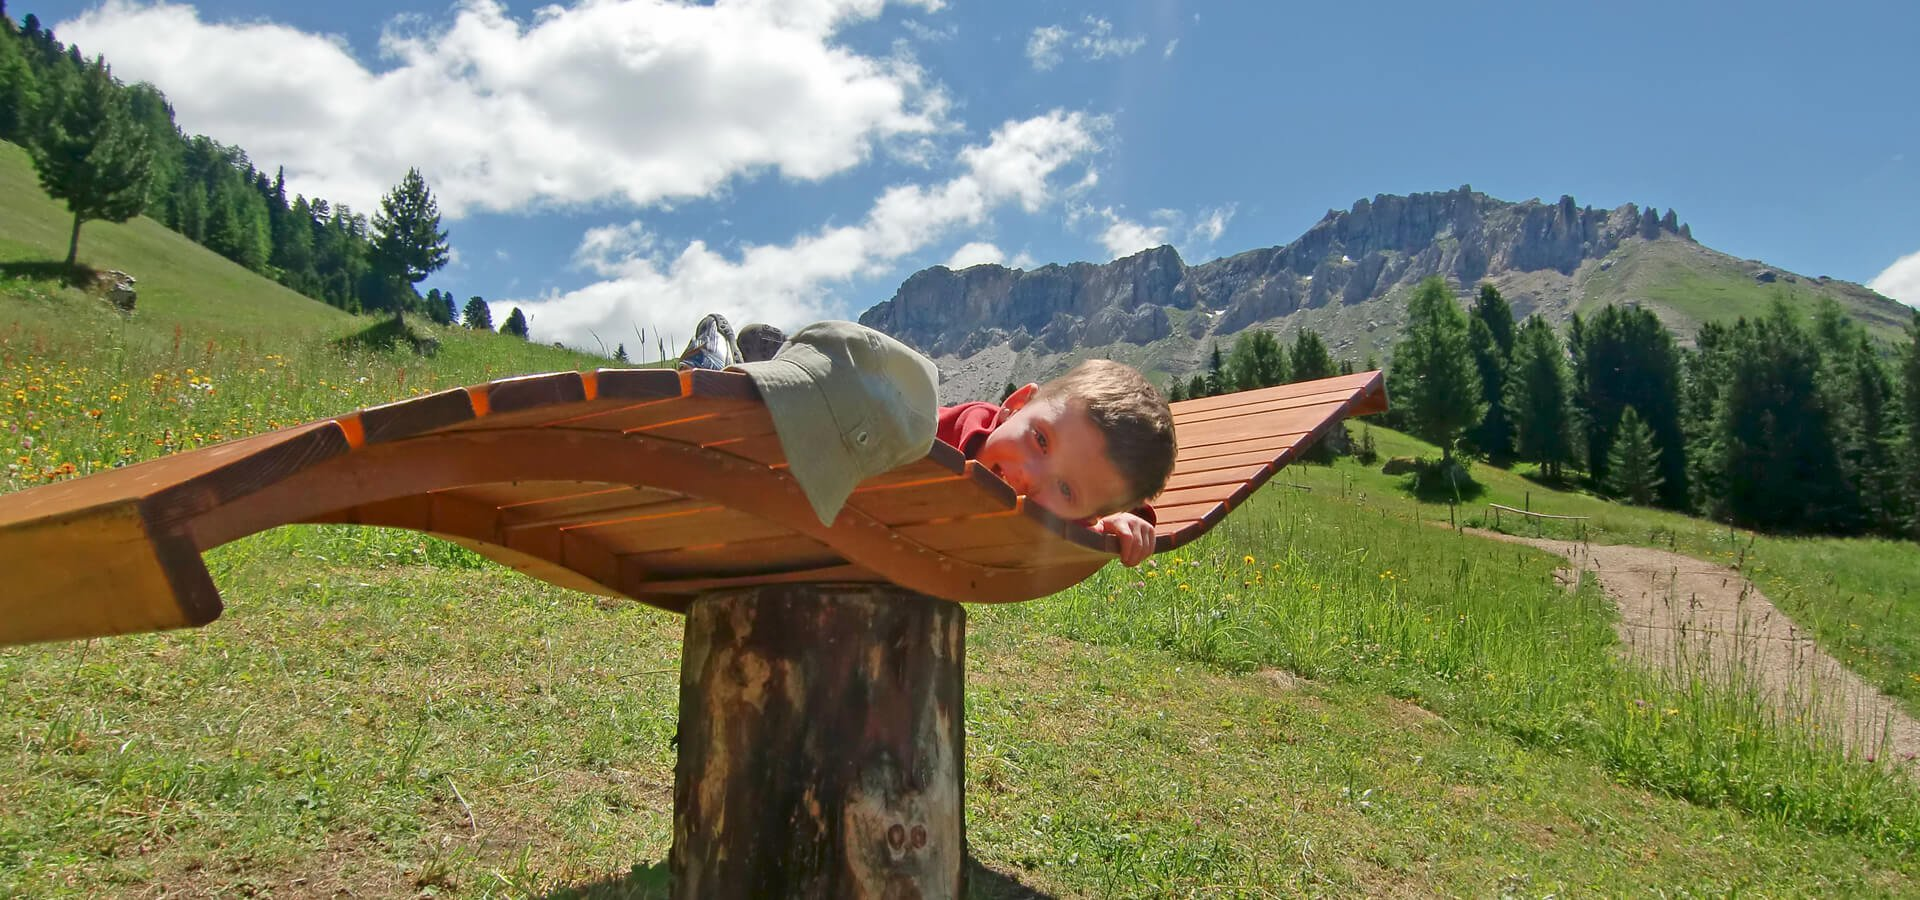 wanderurlaub mit kindern südtirol